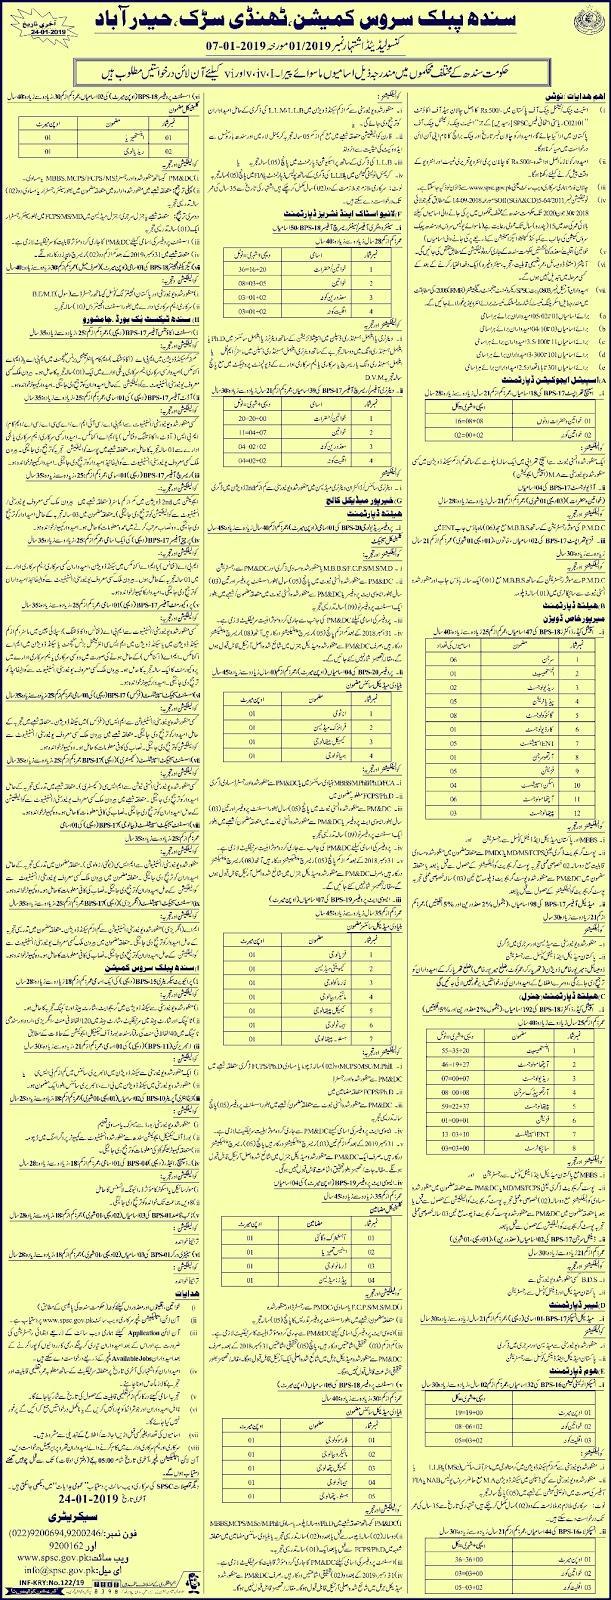 SPSC New Jobs 2019 | Sindh Public Service Commission Jobs 2019 | 463+ New Vacancies